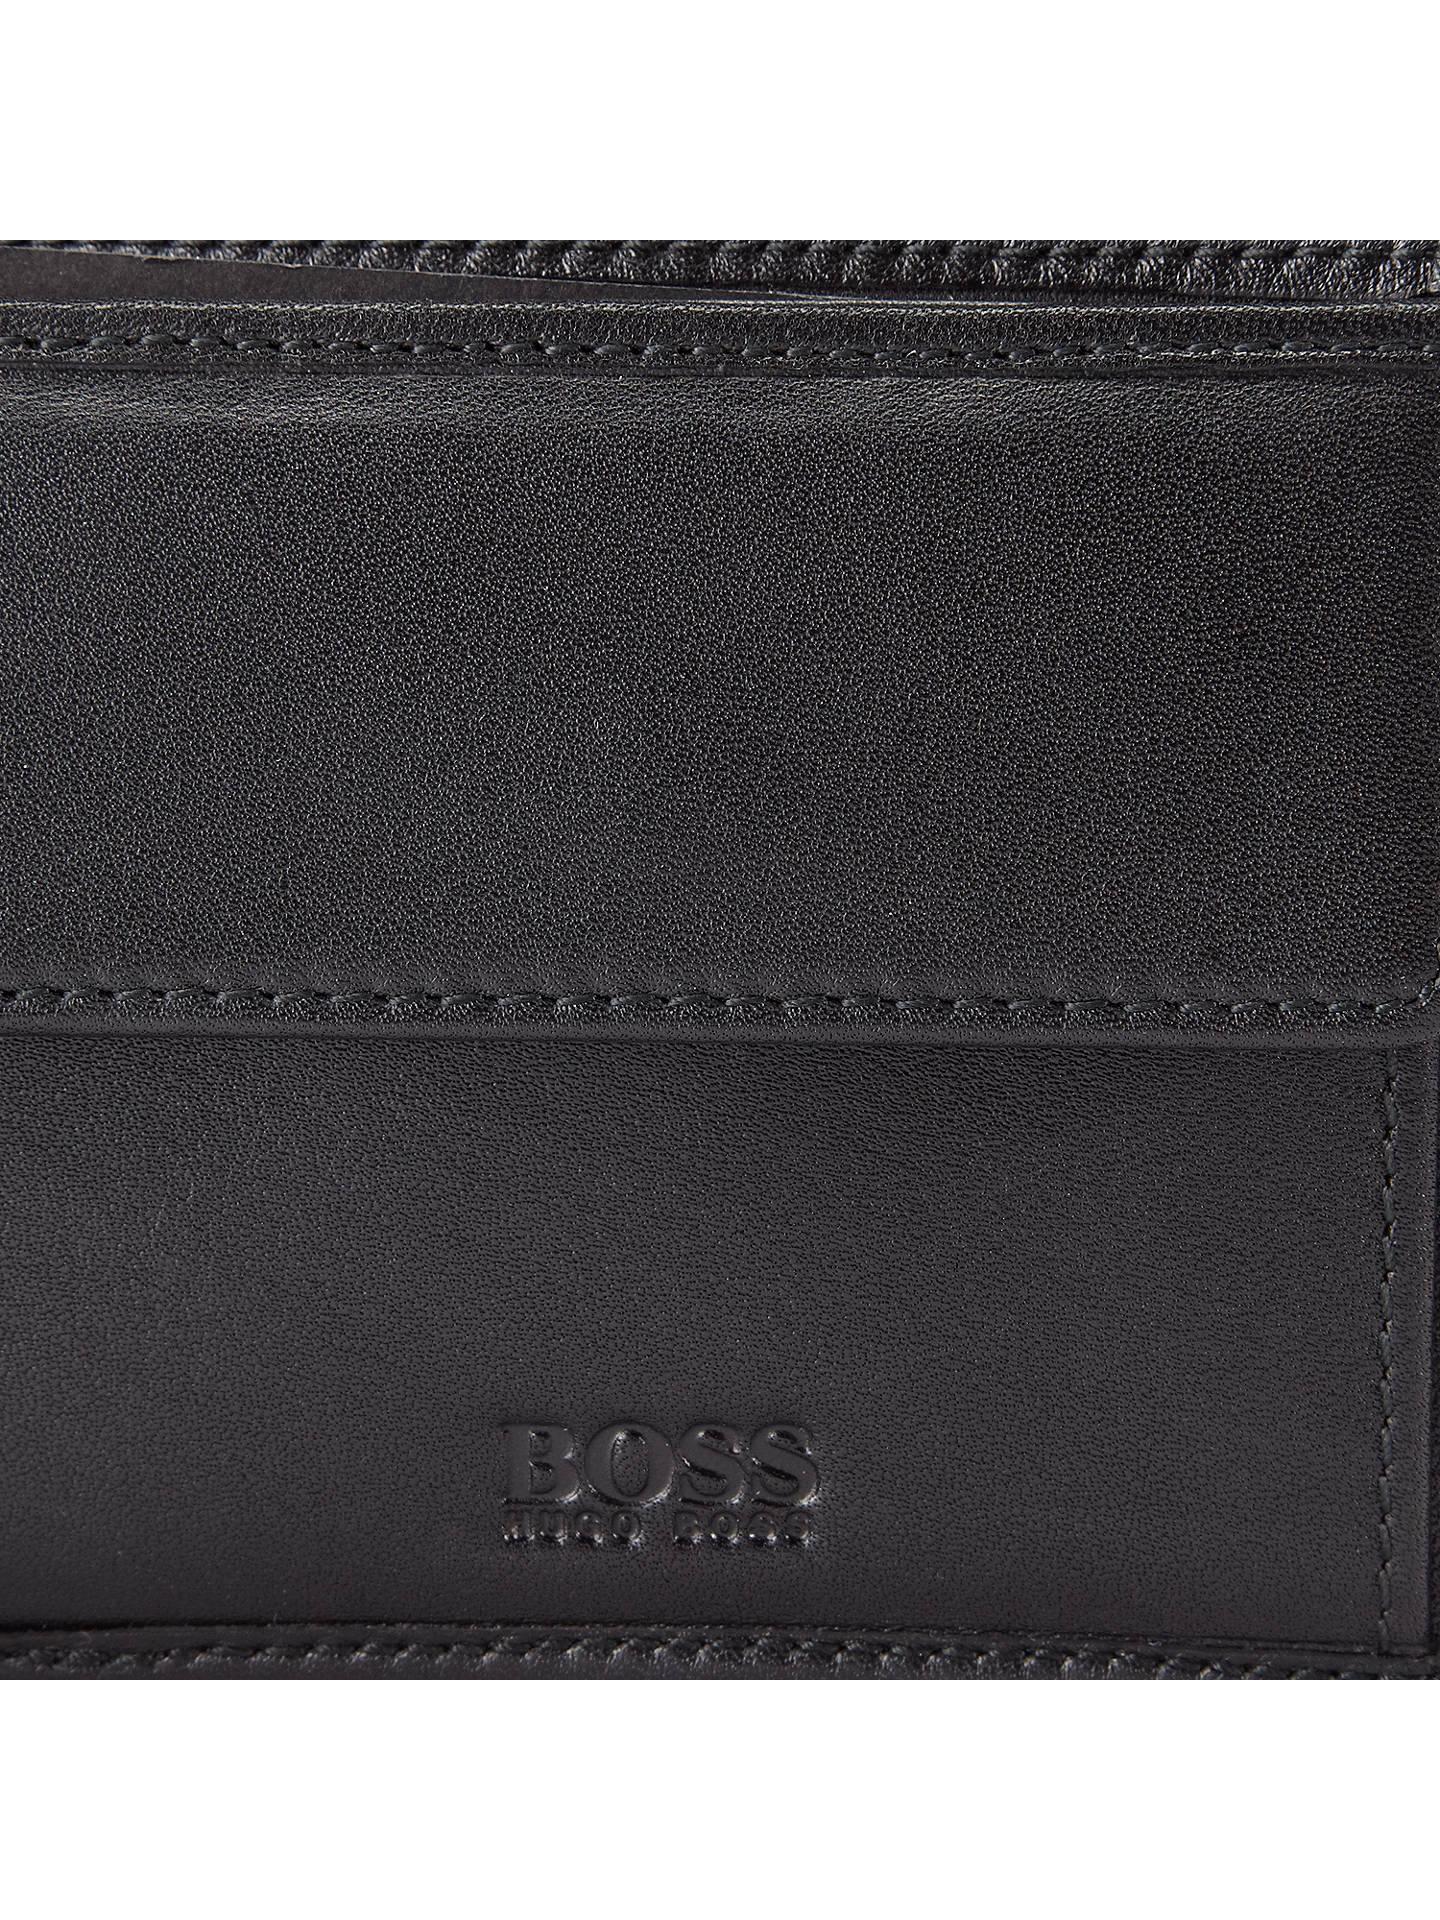 Partners amp; Bi Fold Leather Asolo Boss At Lewis Wallet Black John vq6z1OZyw4